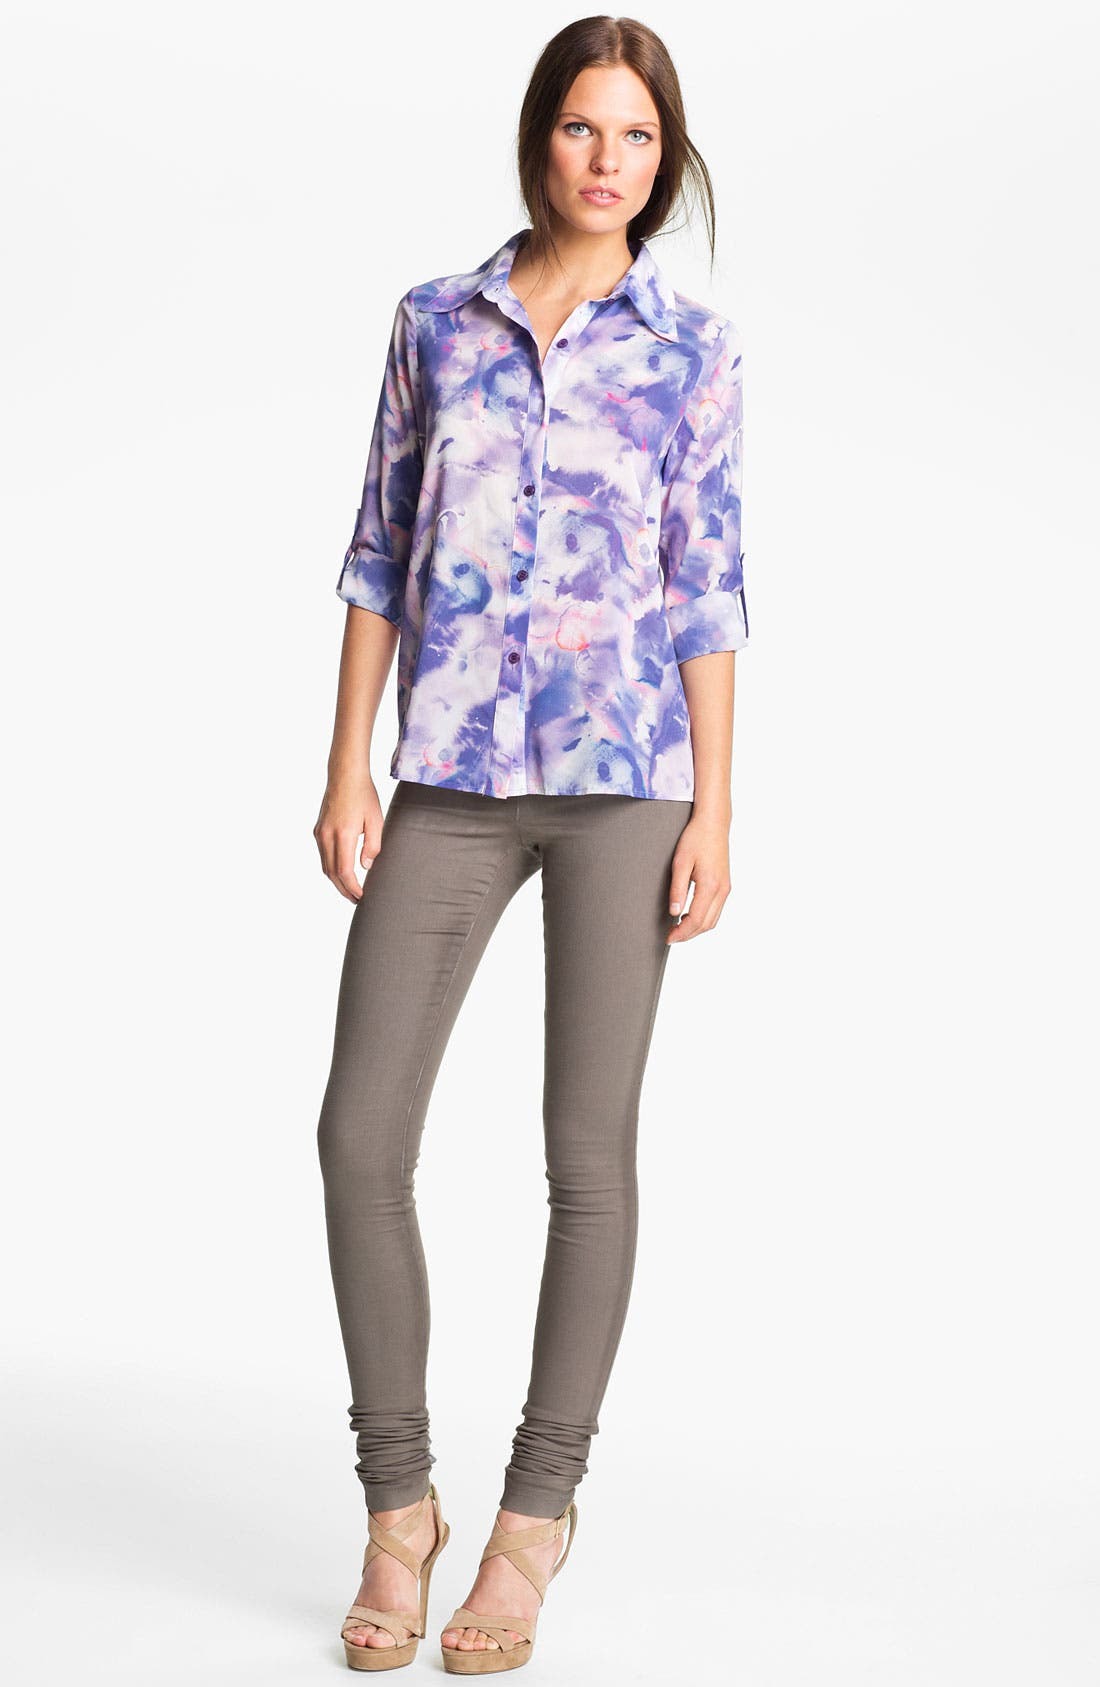 Main Image - Alice + Olivia 'Juliette' Tie Dye Stretch Silk Shirt